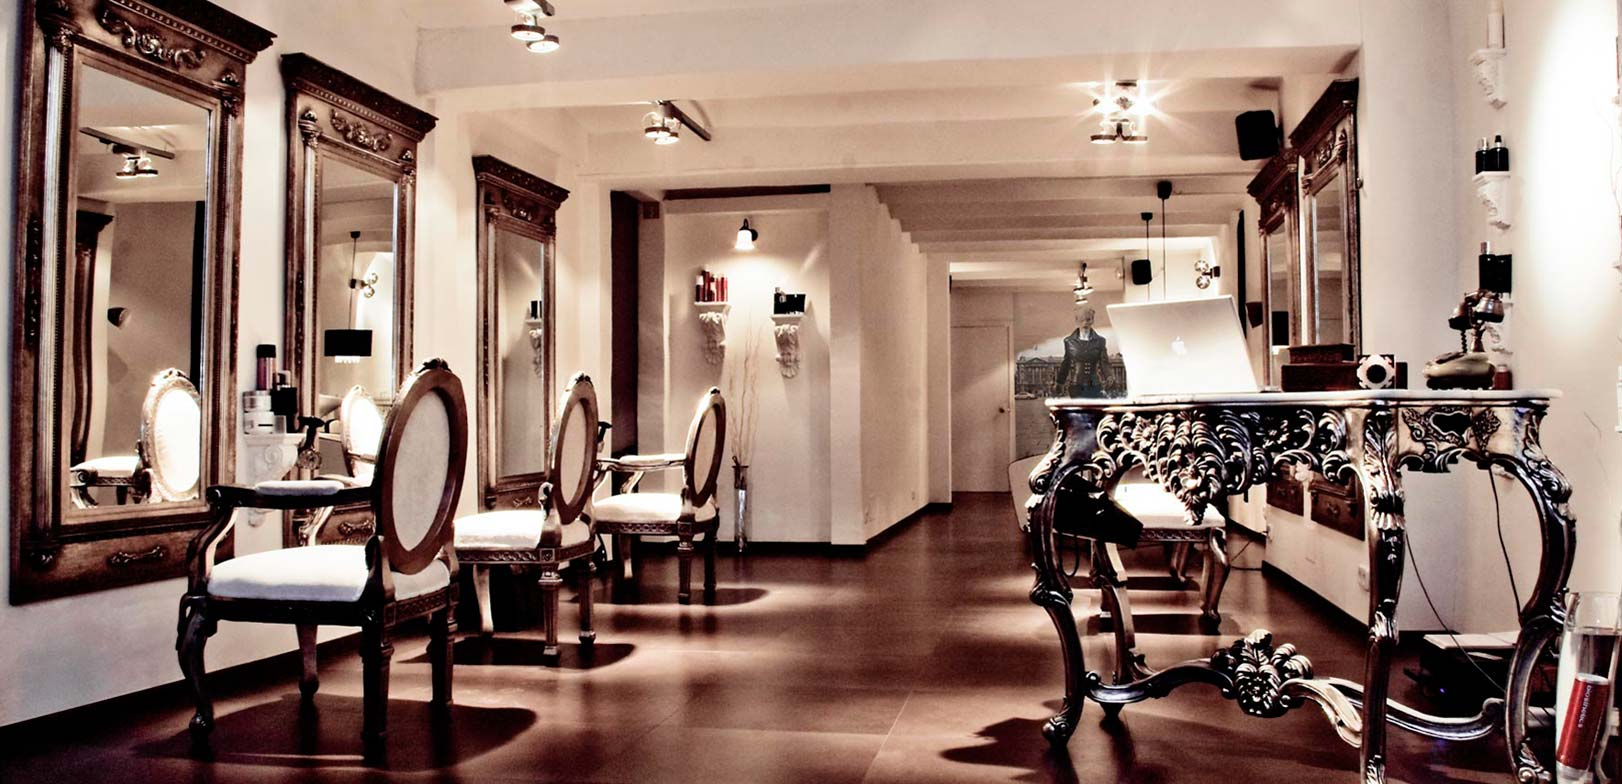 Salones de peluqueria de diseo best saln toro peluquera y for Peluqueria y salon de belleza